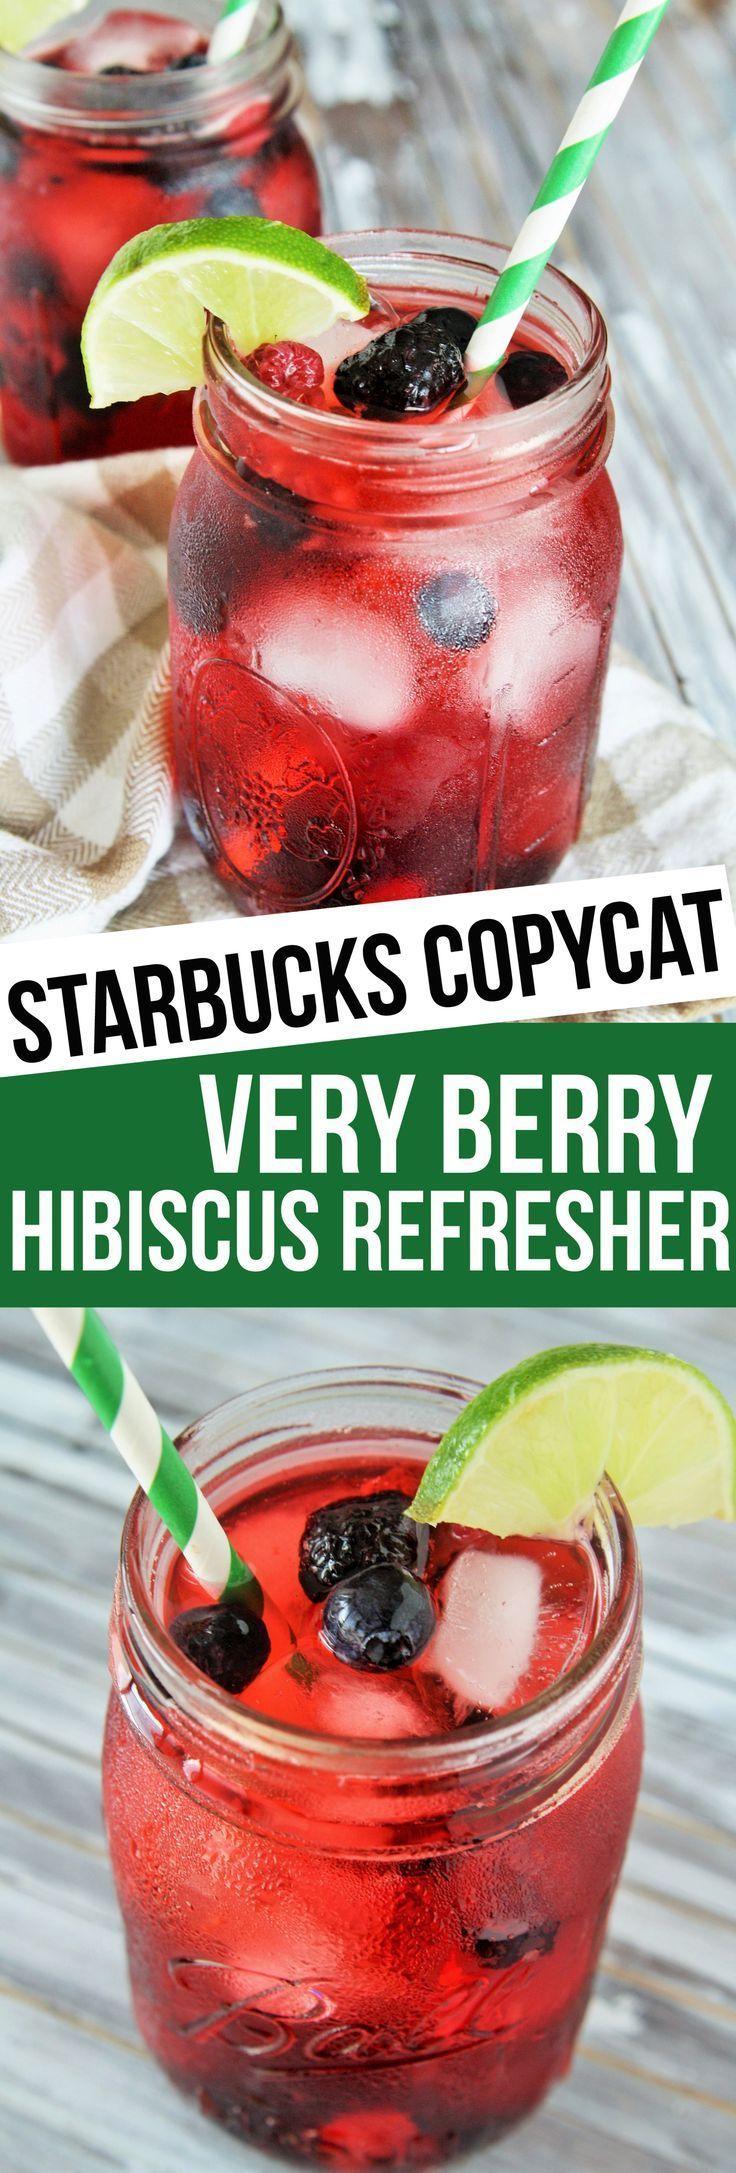 how do you make starbucks refreshers